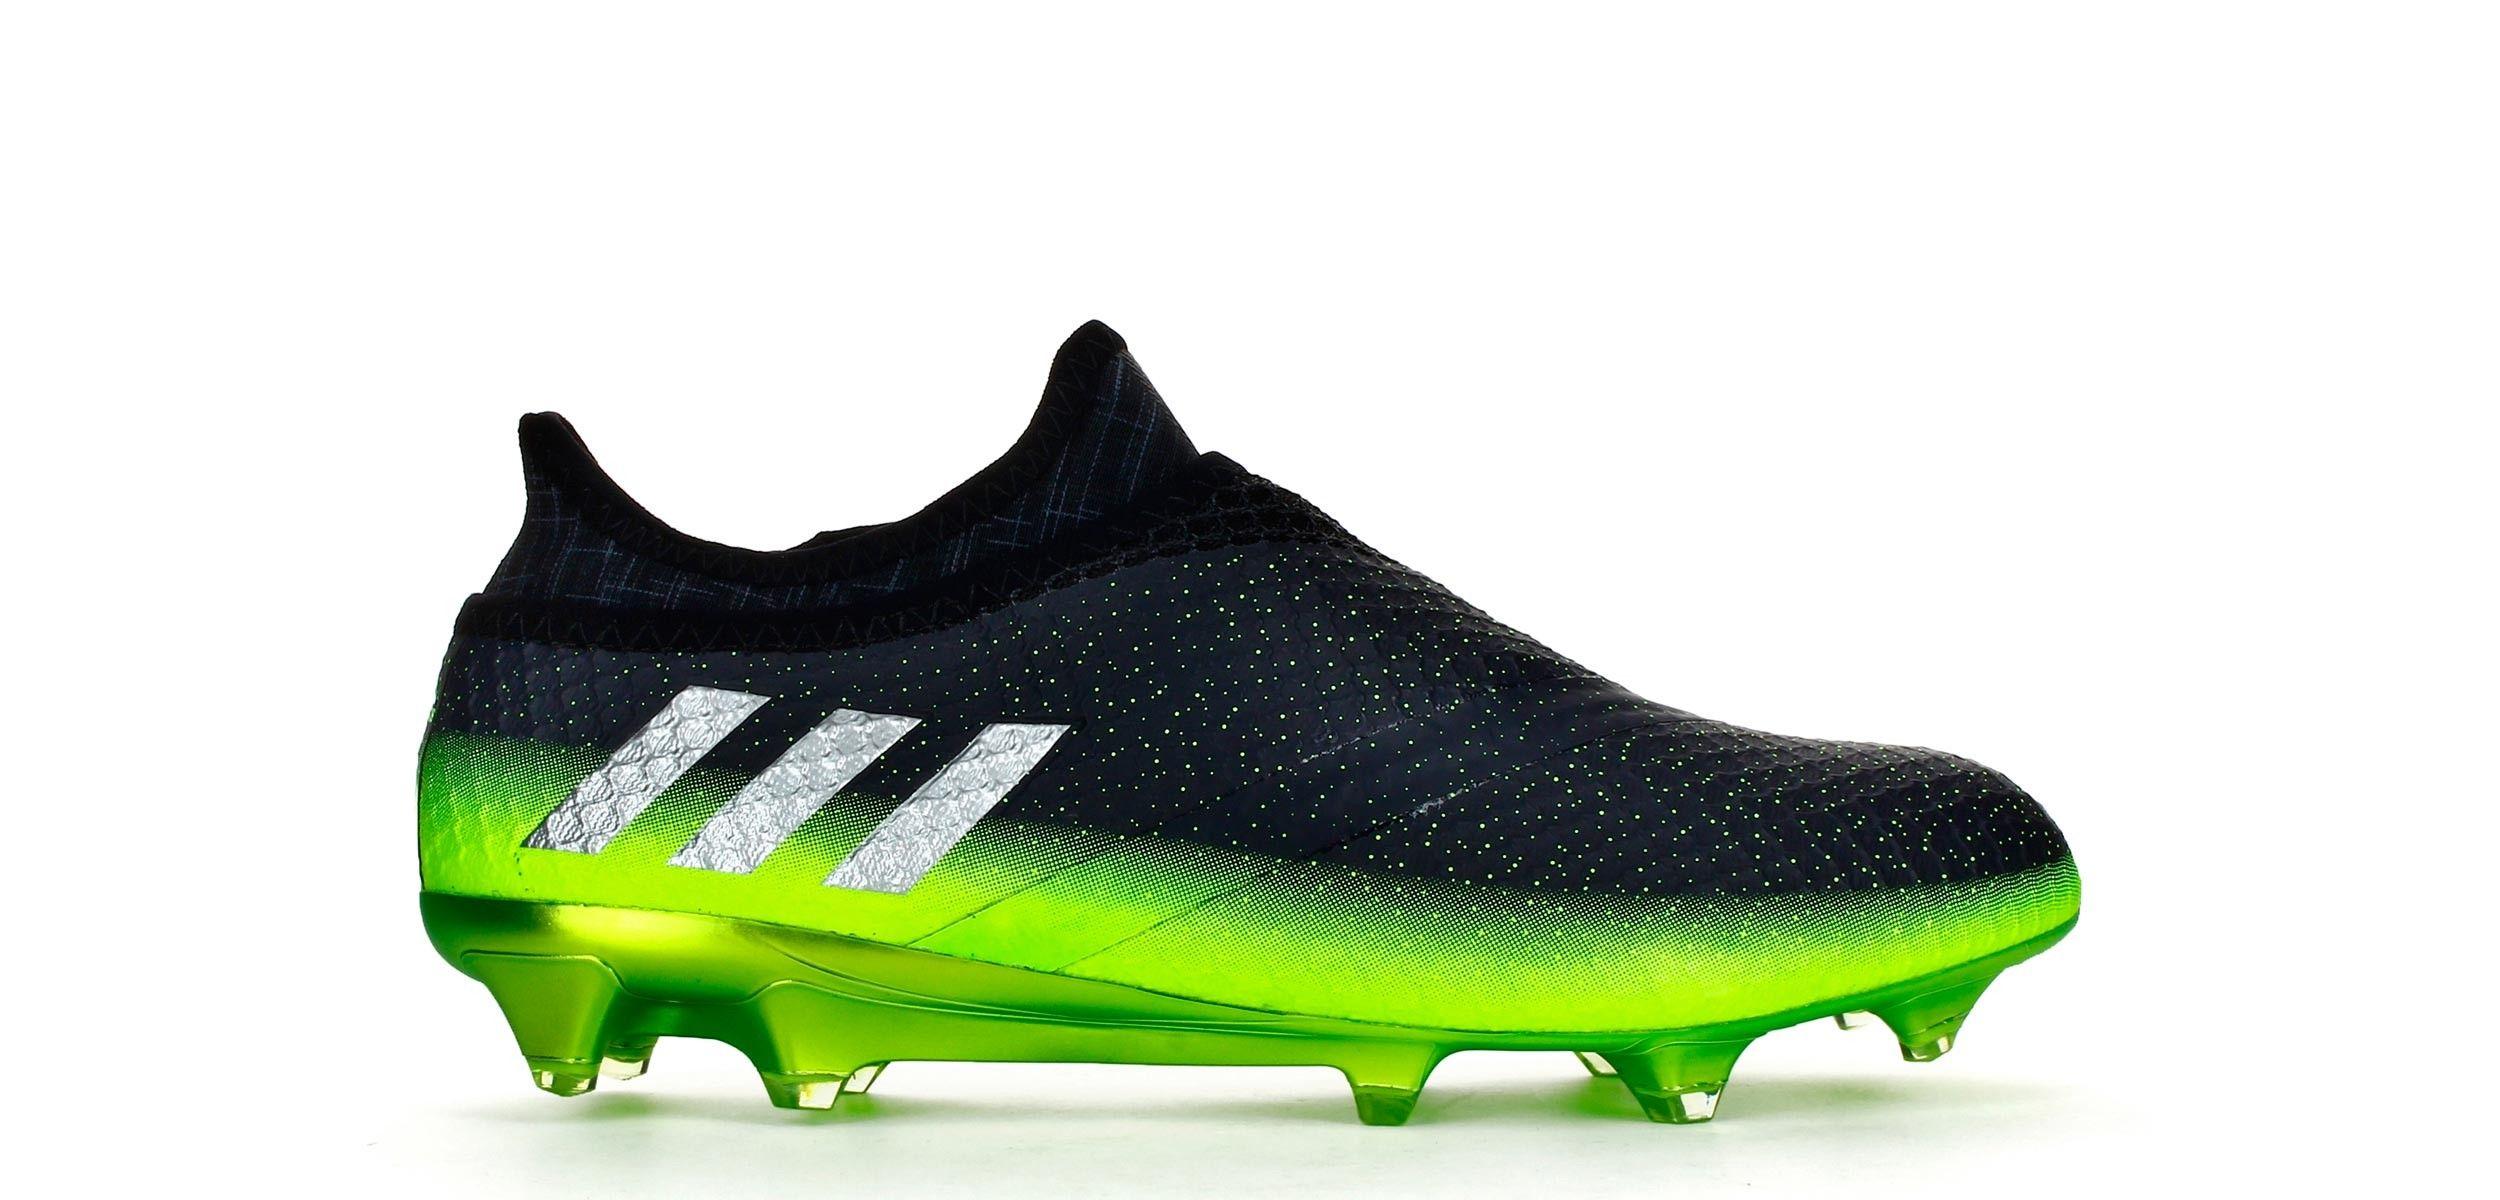 b37d35c1deac2 Botas de fútbol adidas Messi 16+ Pureagility FG - Gris Oscuro   Verde Solar  - Exterior pie derecho